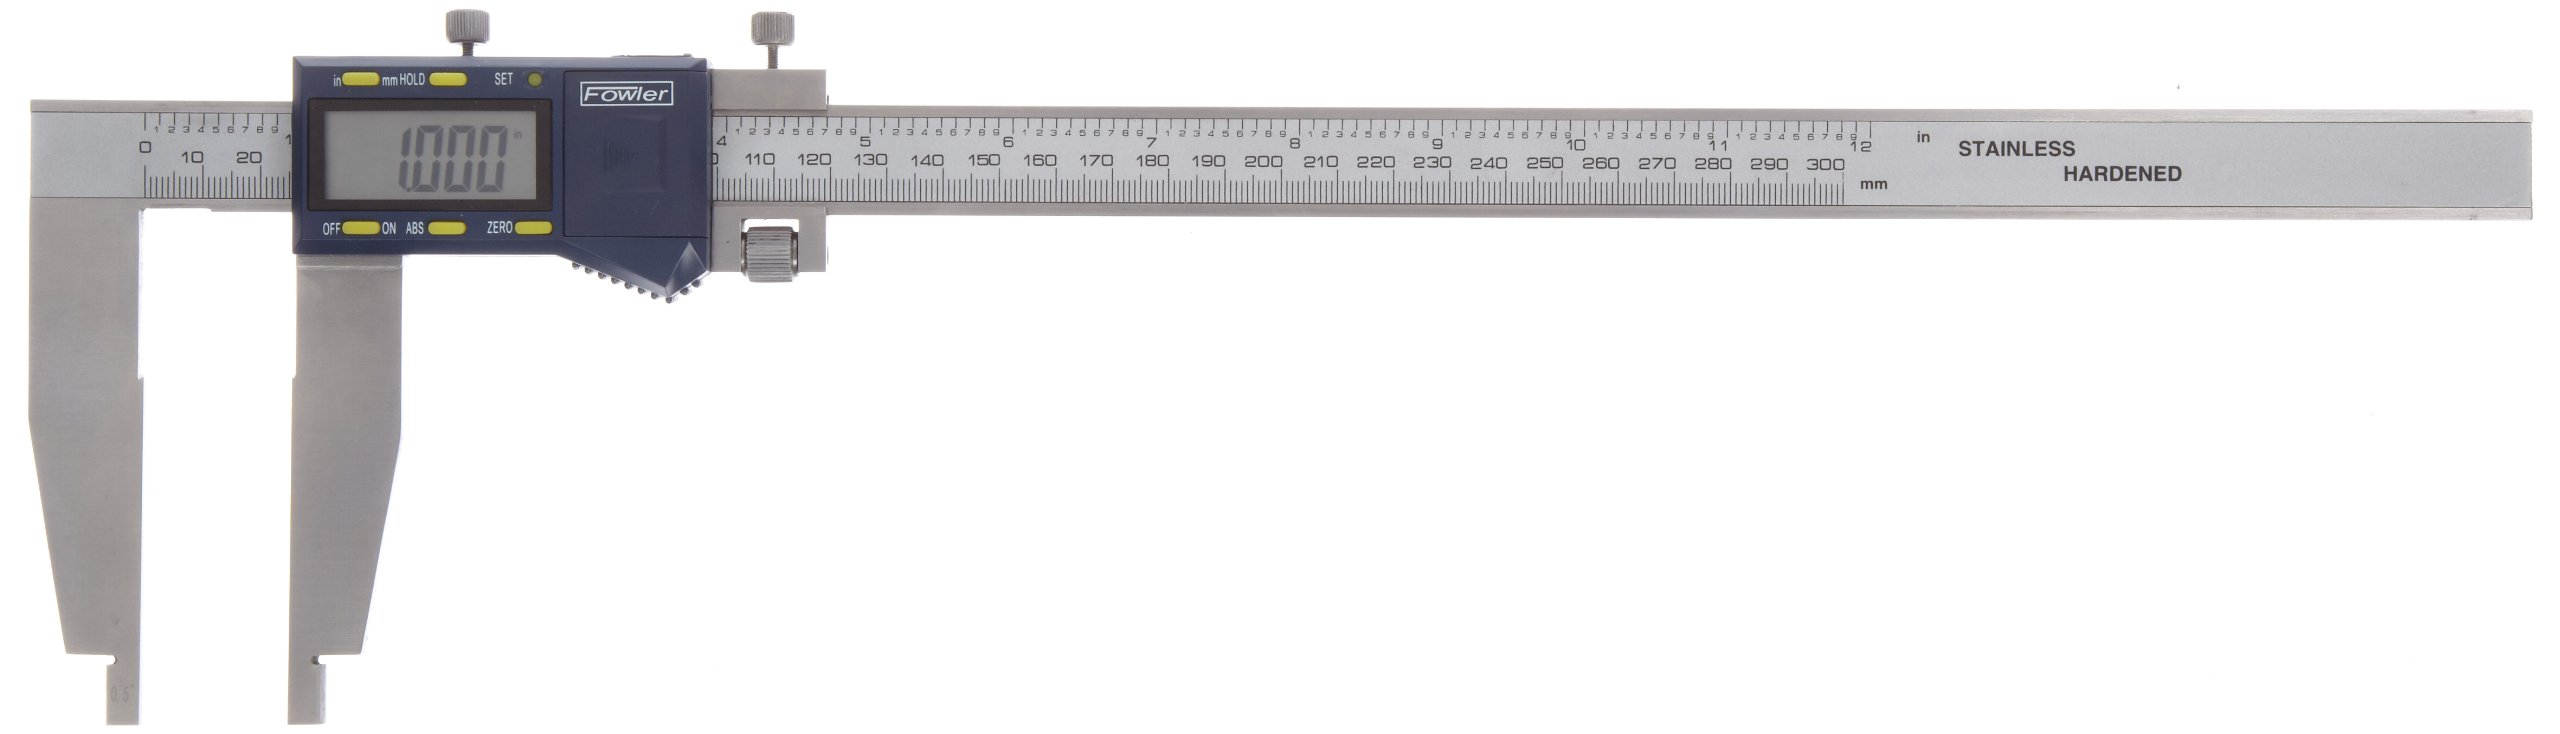 Fowler Full 2 year warranty Xtra-Range Electronic Caliper, 54-100-312, 0-12'' Measuring Range, 0.0005'' Resolution